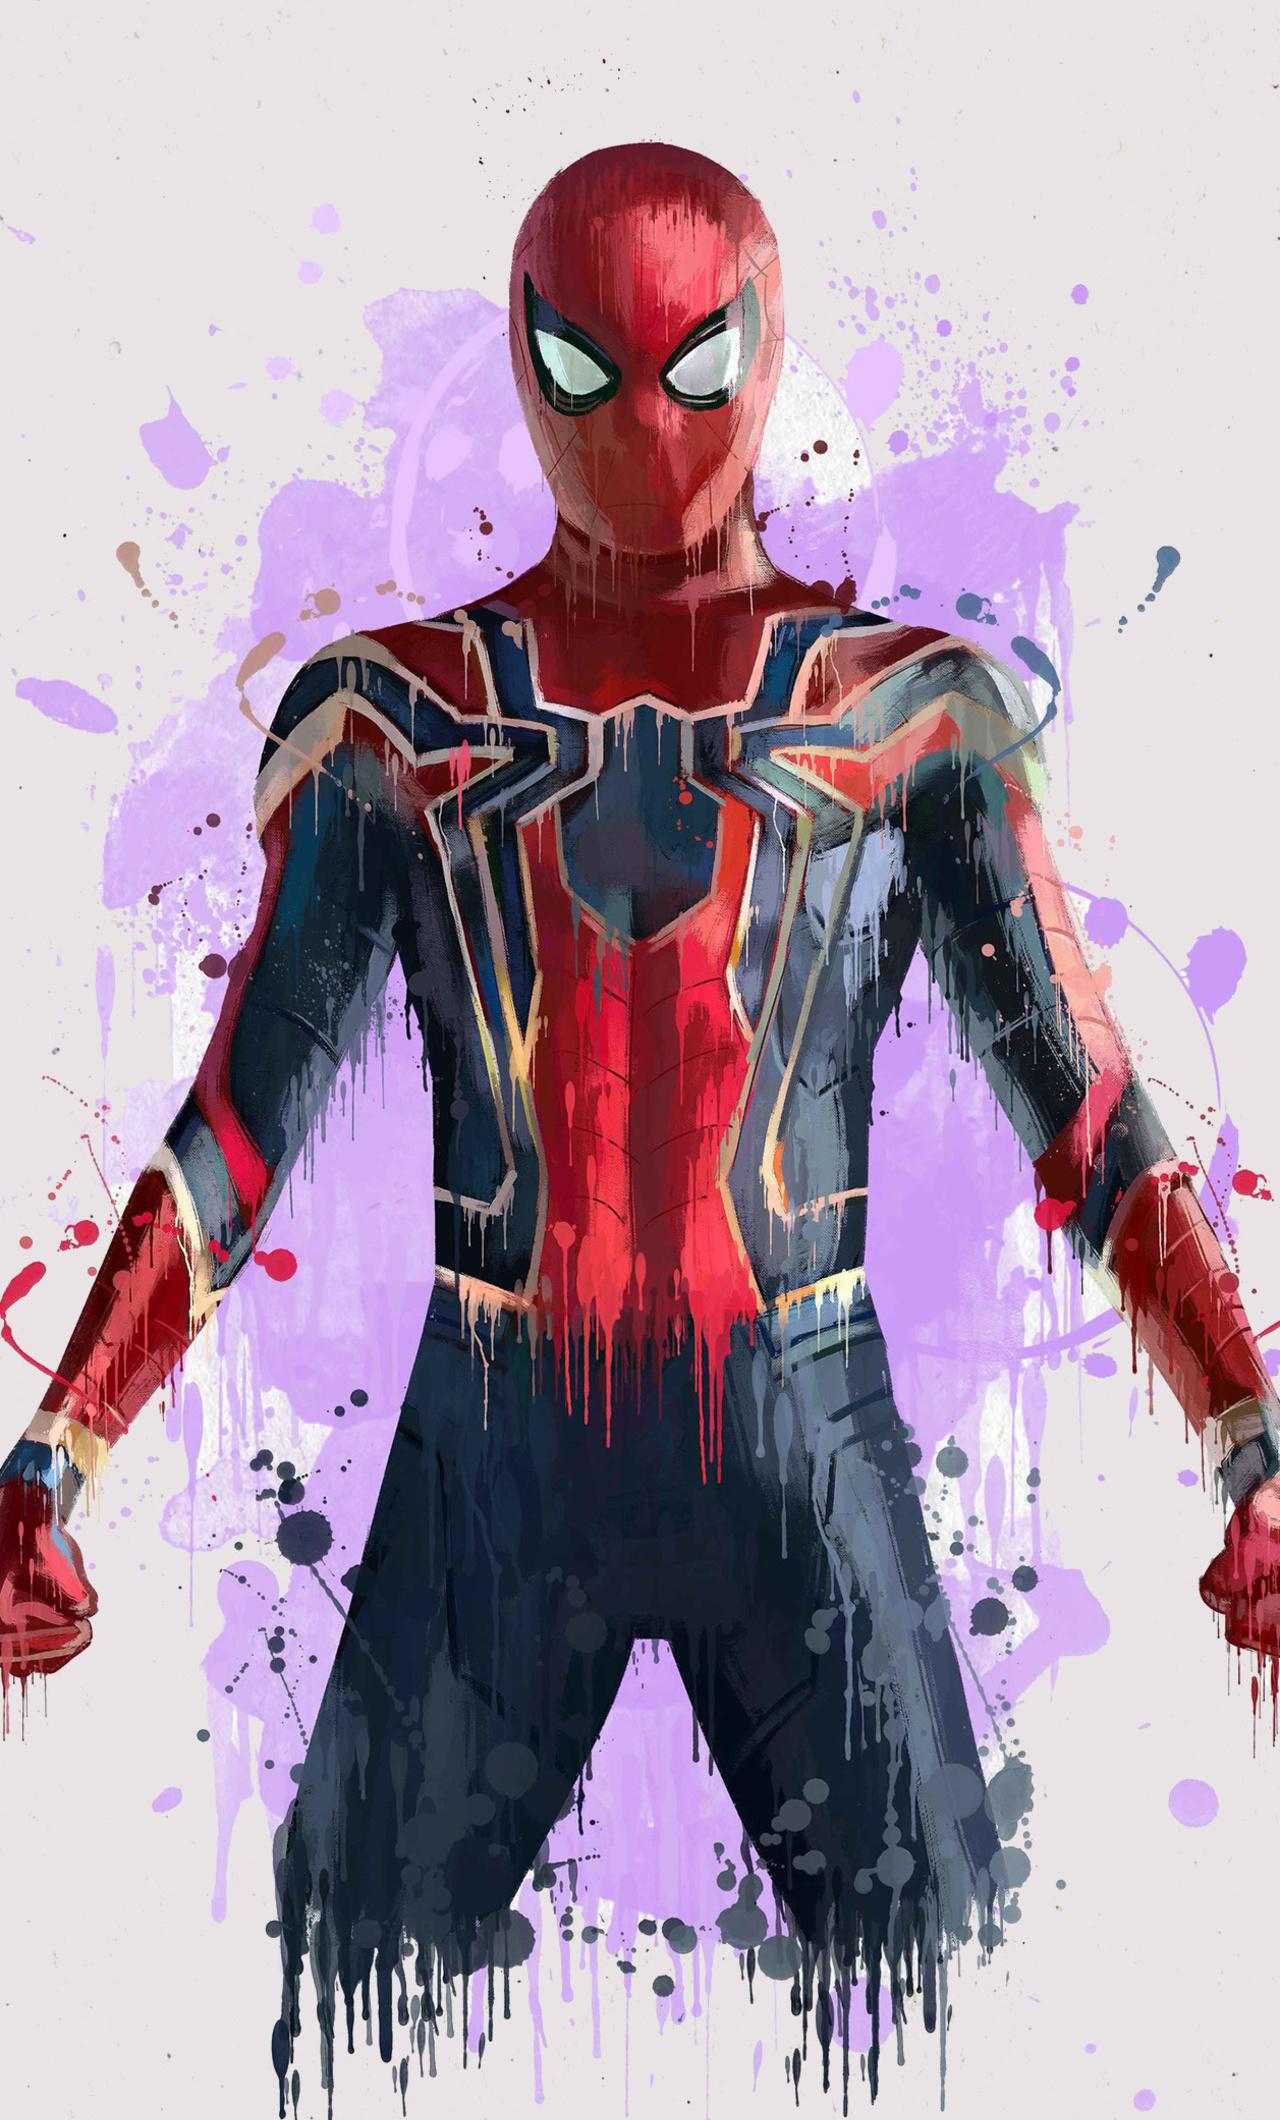 1280x2120 spiderman in avengers infinity war 2018 artwork